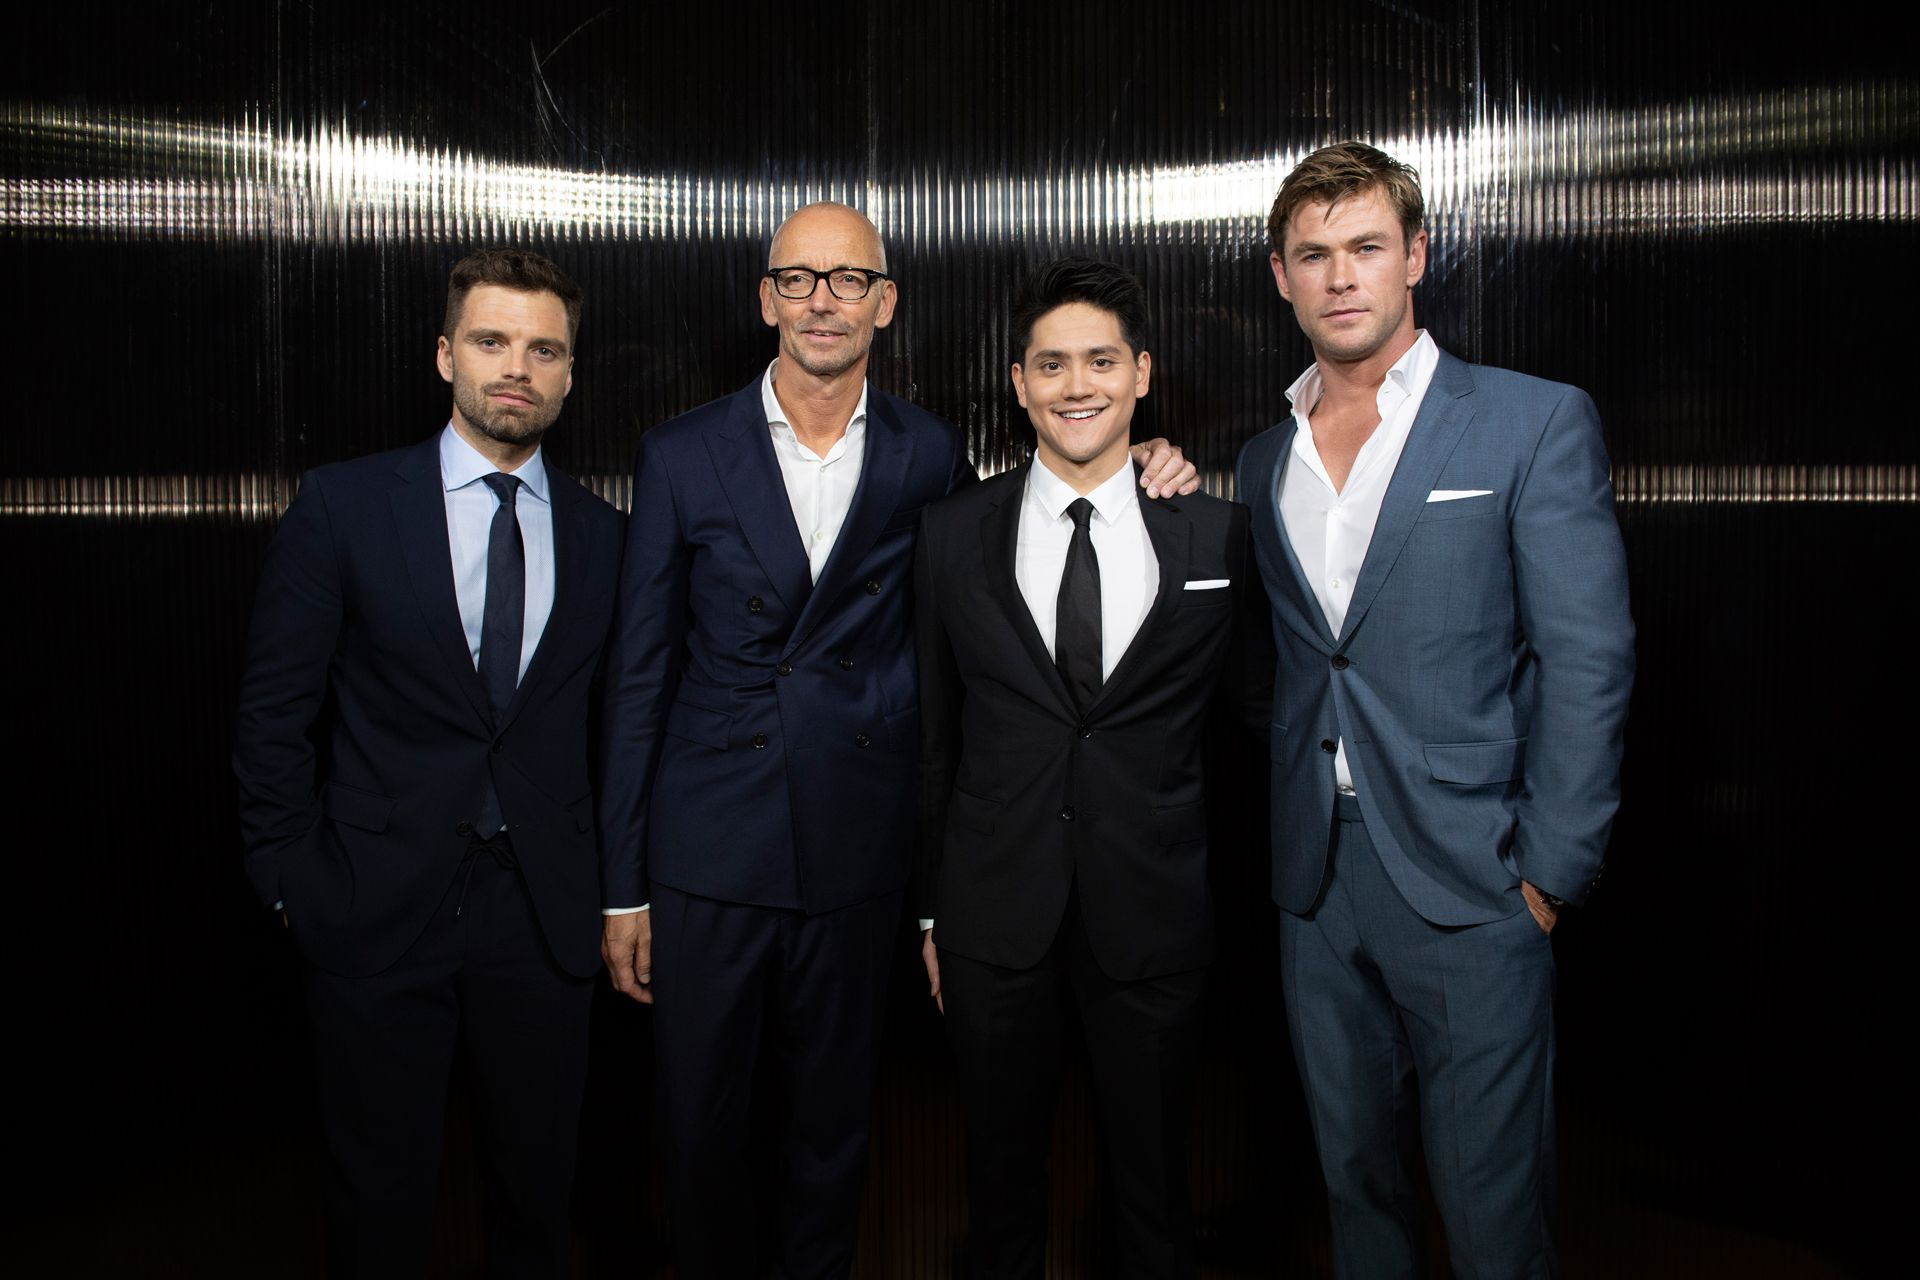 Sebastian Stan, Ingo Wilts (CBO HUGO BOSS), Joseph Schooling, and Chris Hemsworth in BOSS